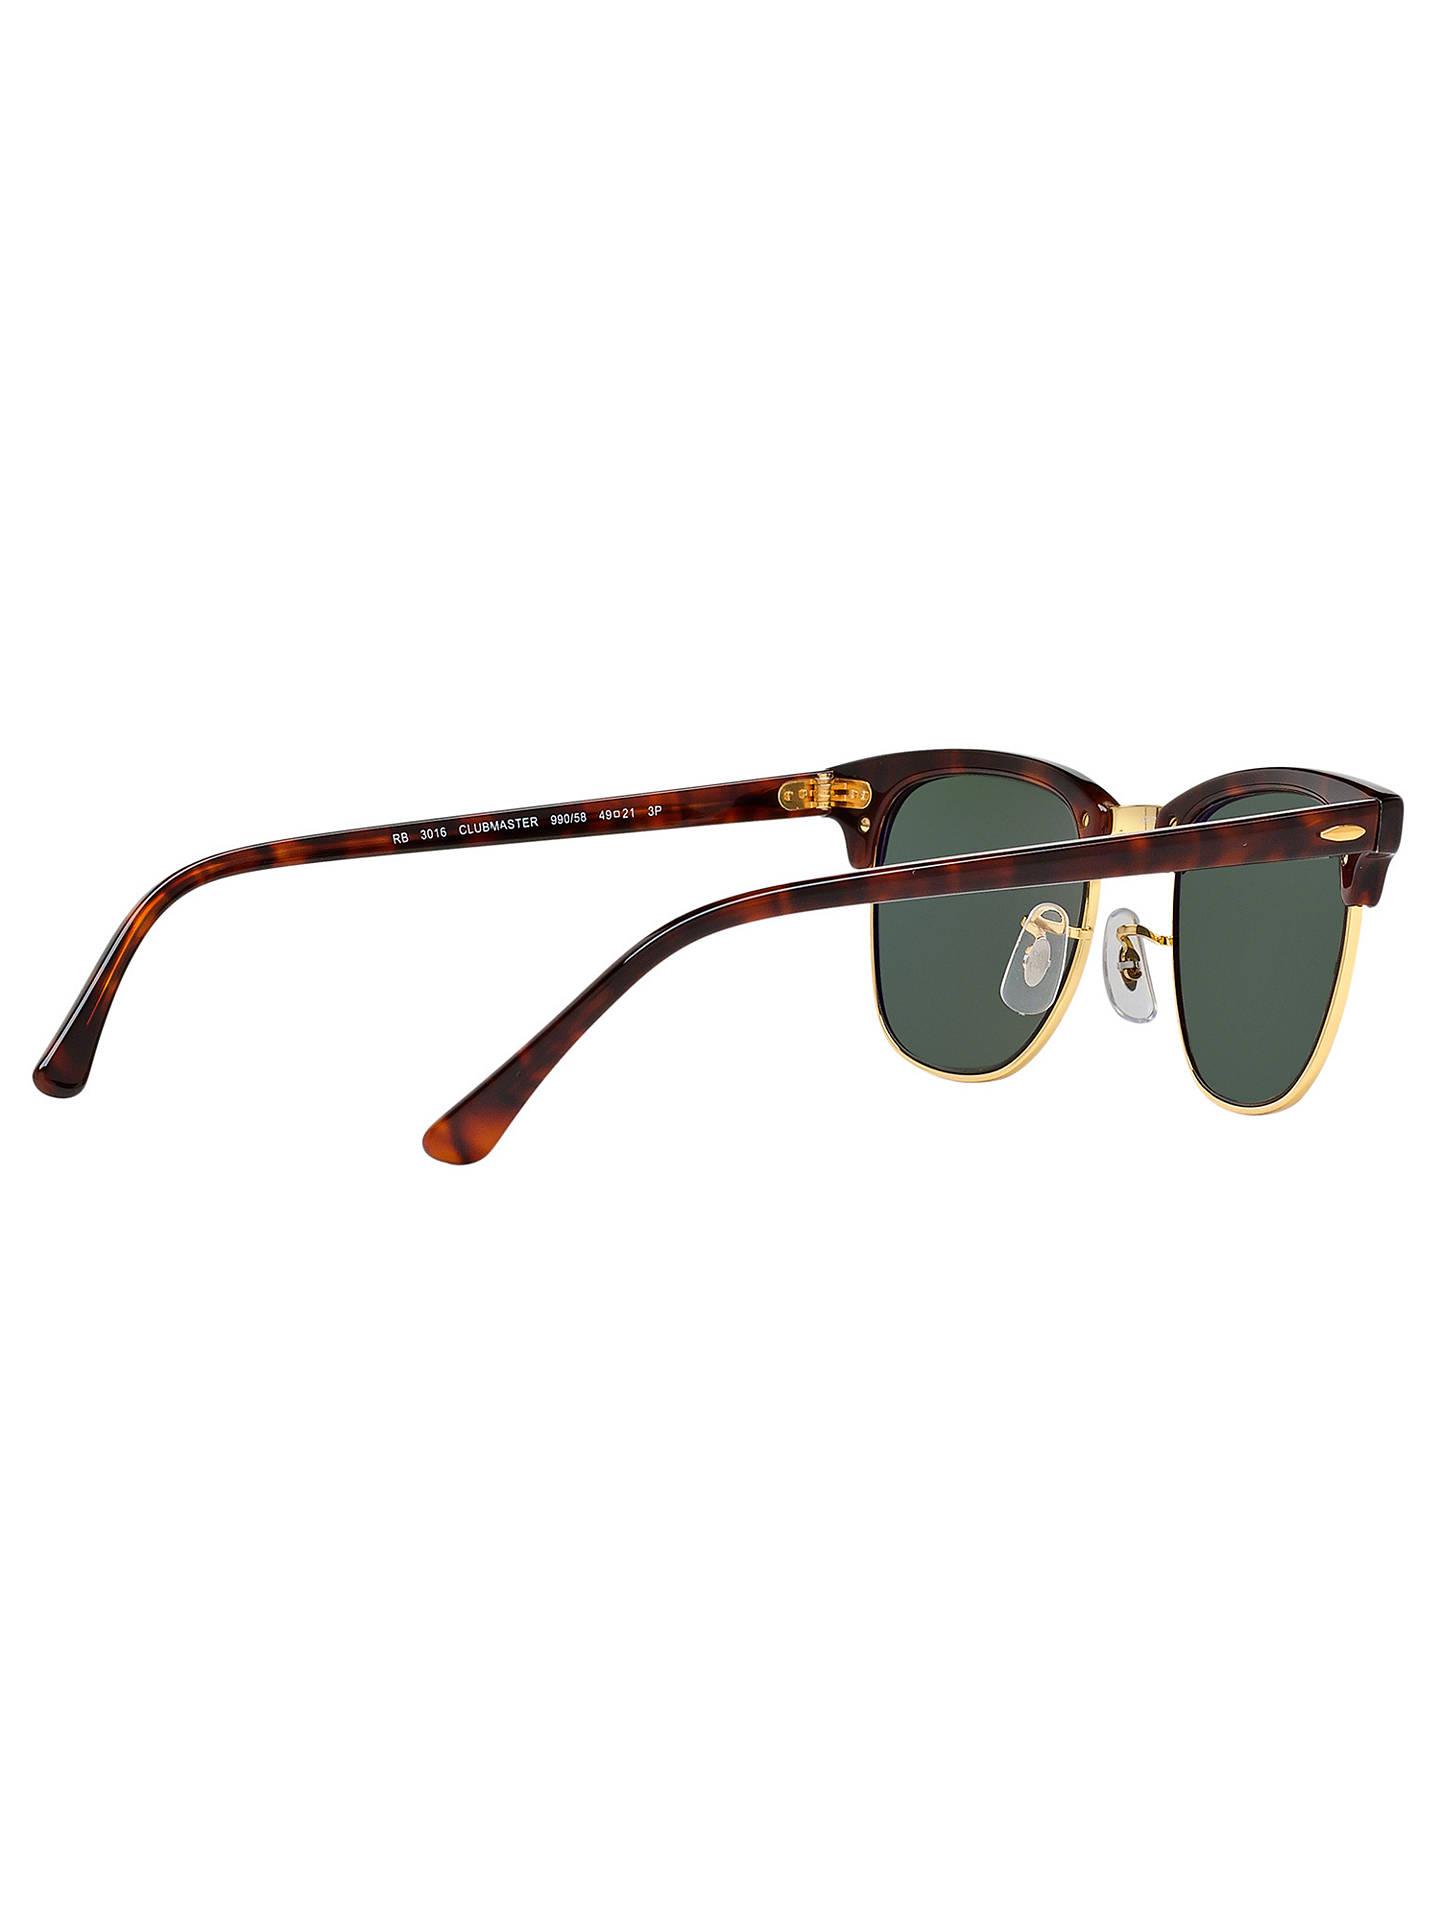 892604682c5 Ray-Ban RB3016 Men s Polarised Clubmaster Sunglasses at John Lewis ...